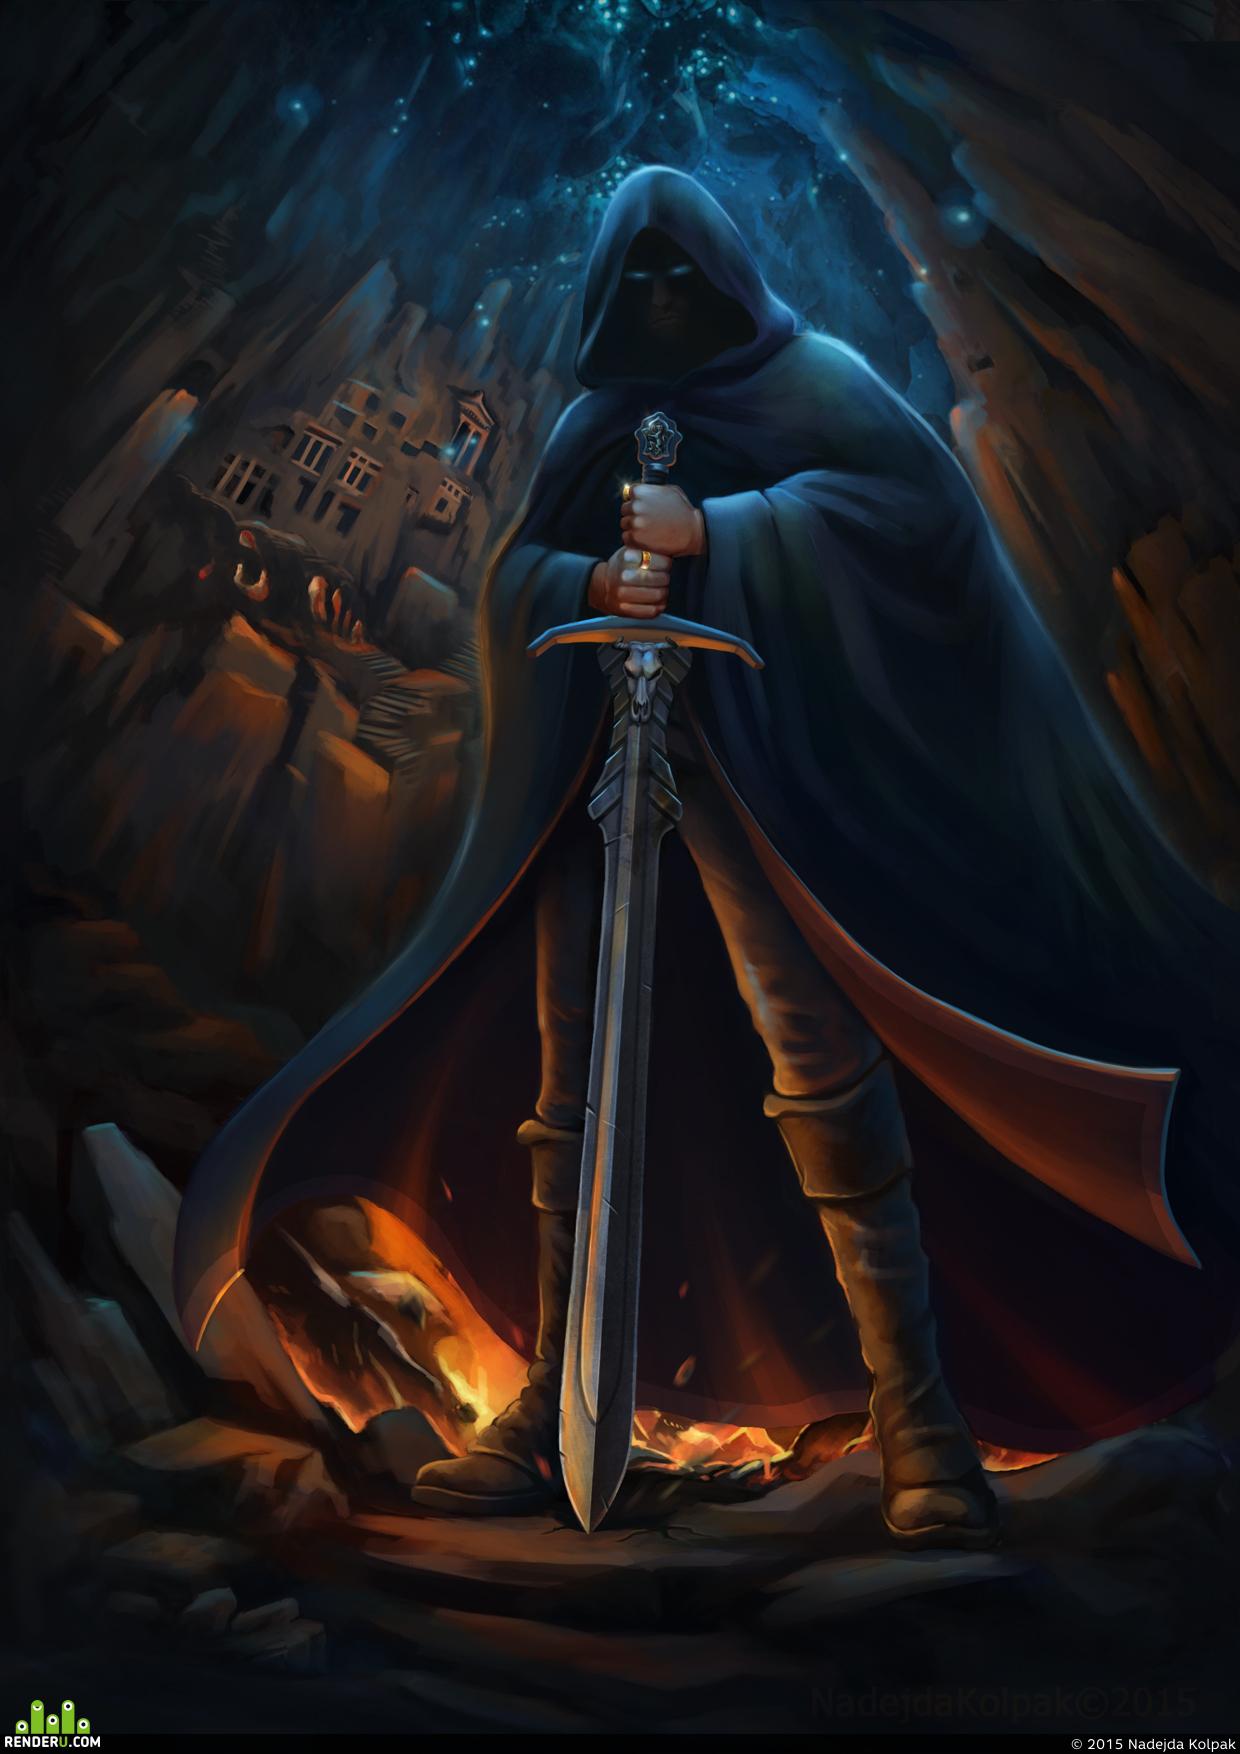 preview Подземное Царство иллюстрация для обложки